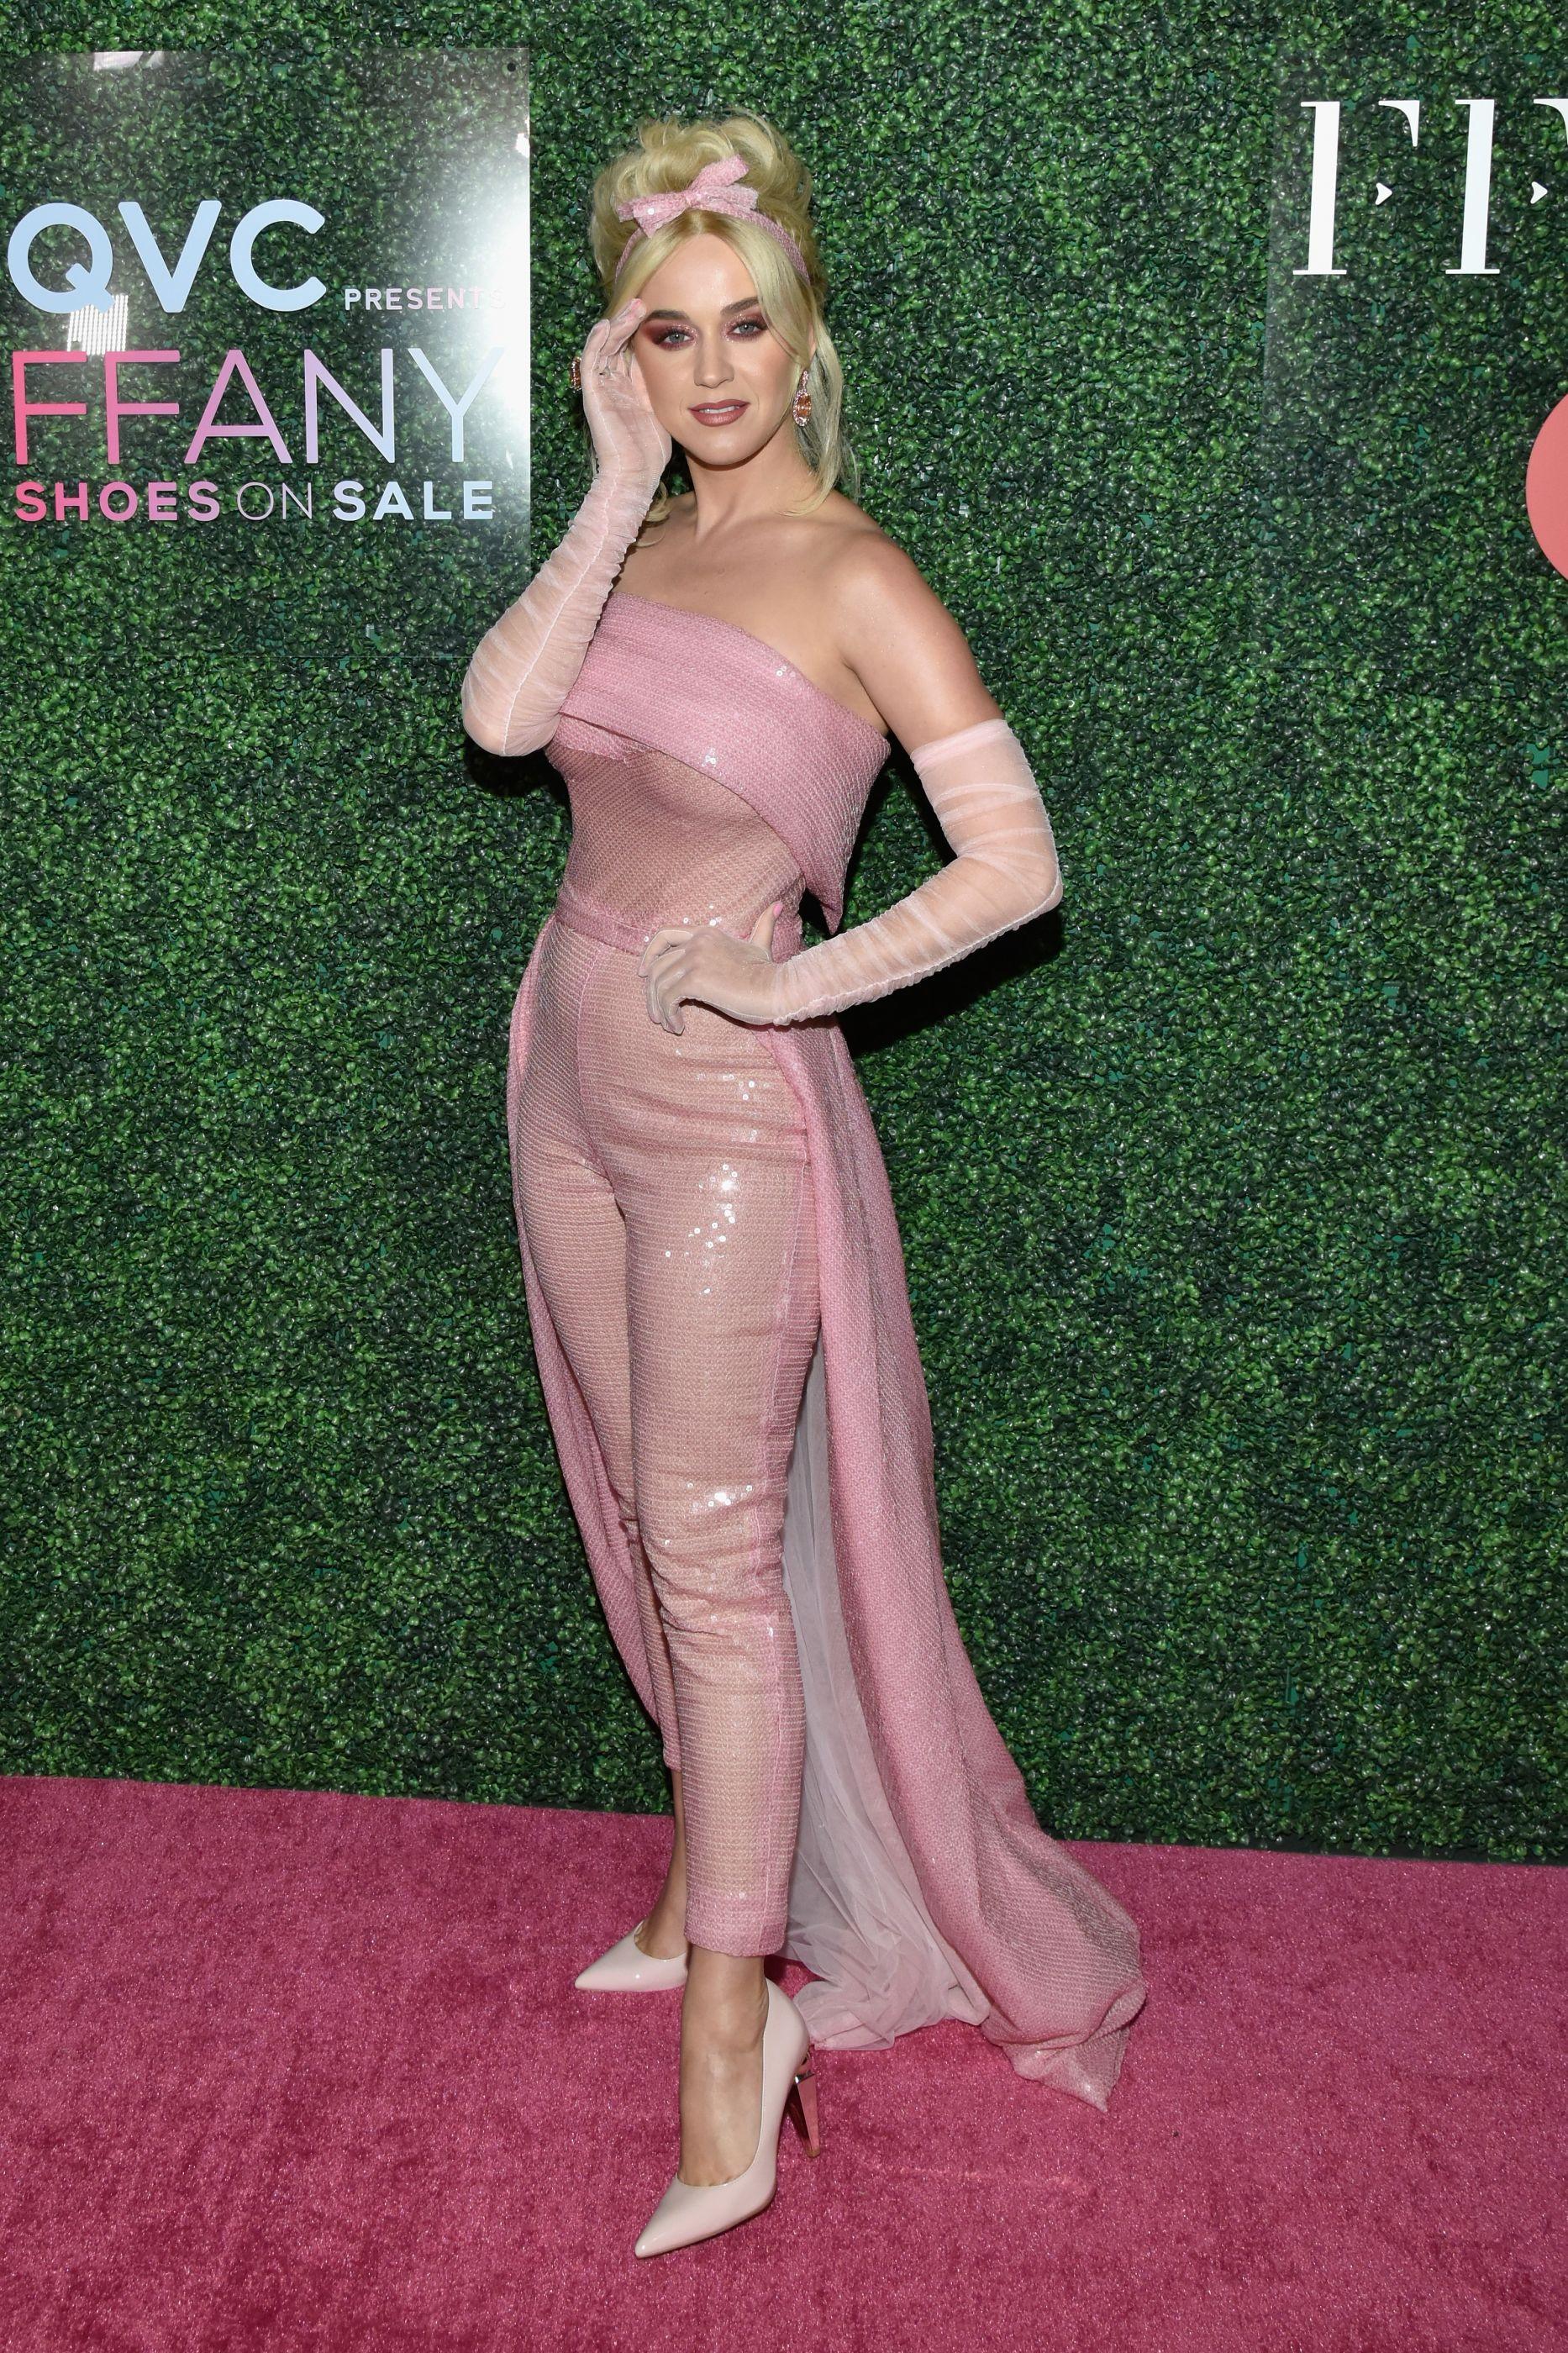 Katy Perry arrasa com look ao estilo Barbie